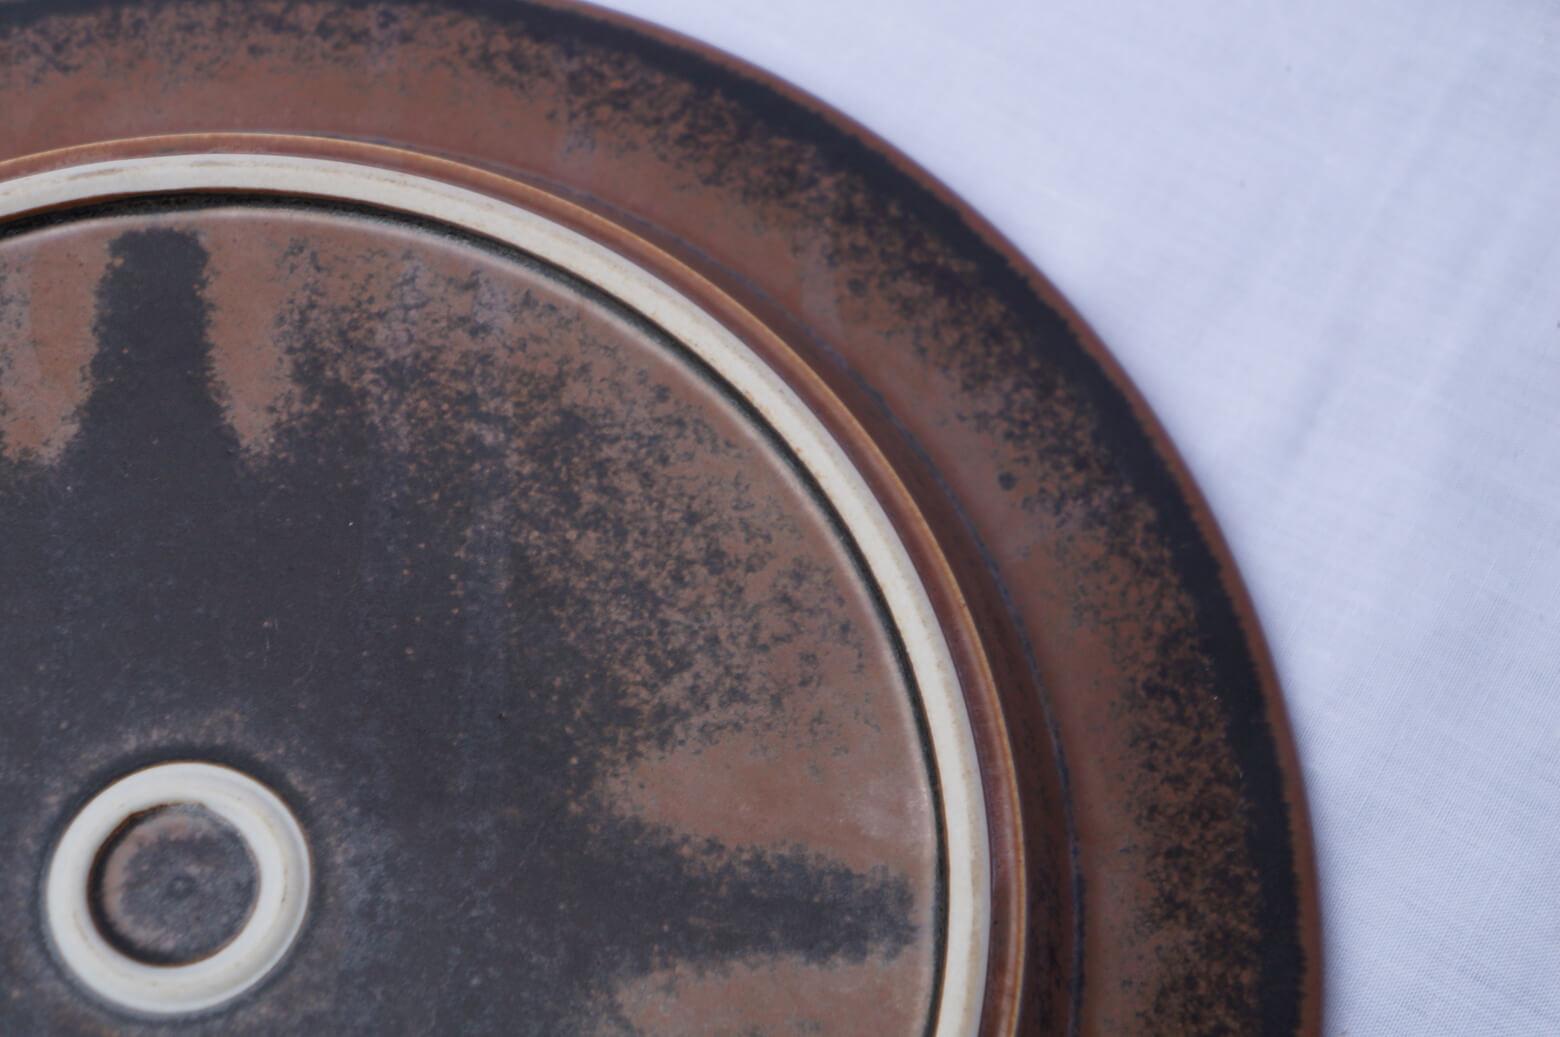 ARABIA RUSKA/アラビア ルスカ ディナープレート 25.5cm 4